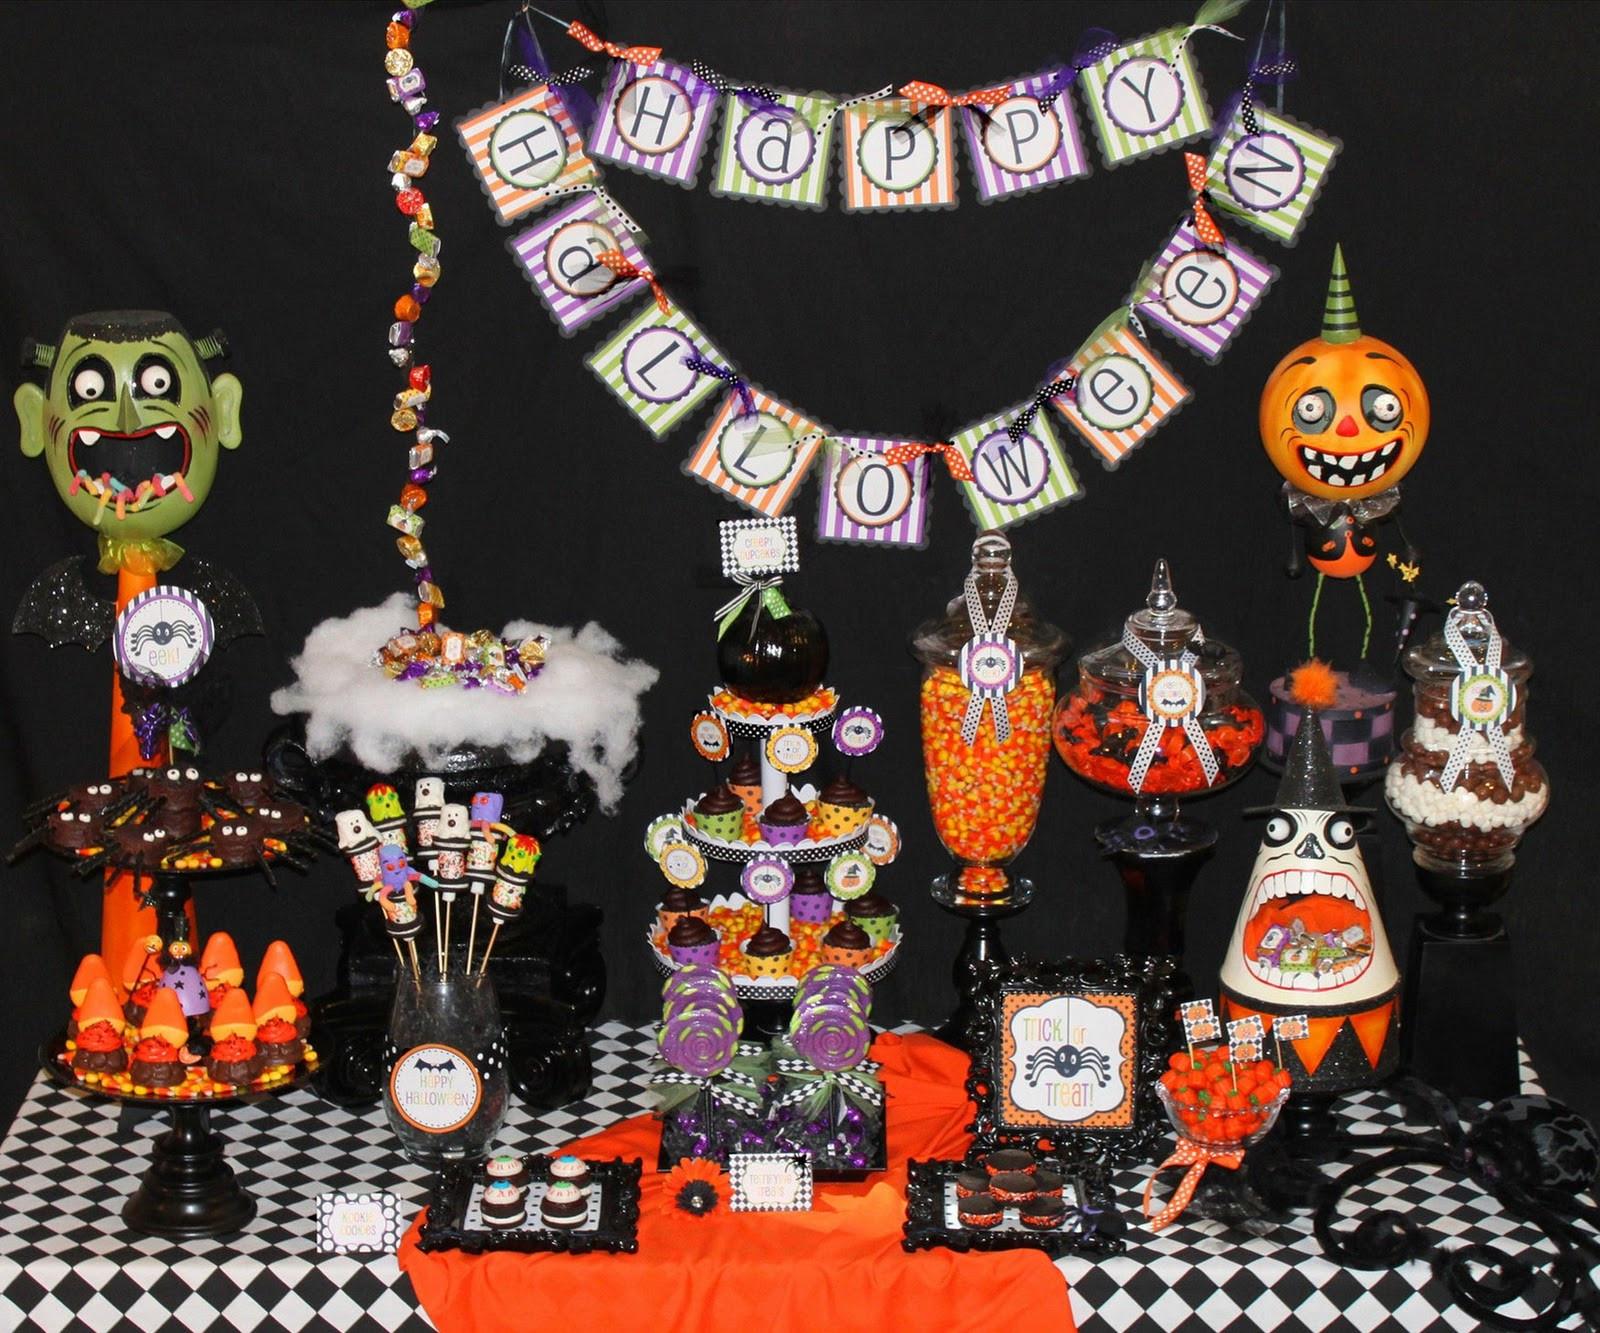 Creative Halloween Party Ideas  Halloween Party Inspiration 10 Creative Designs